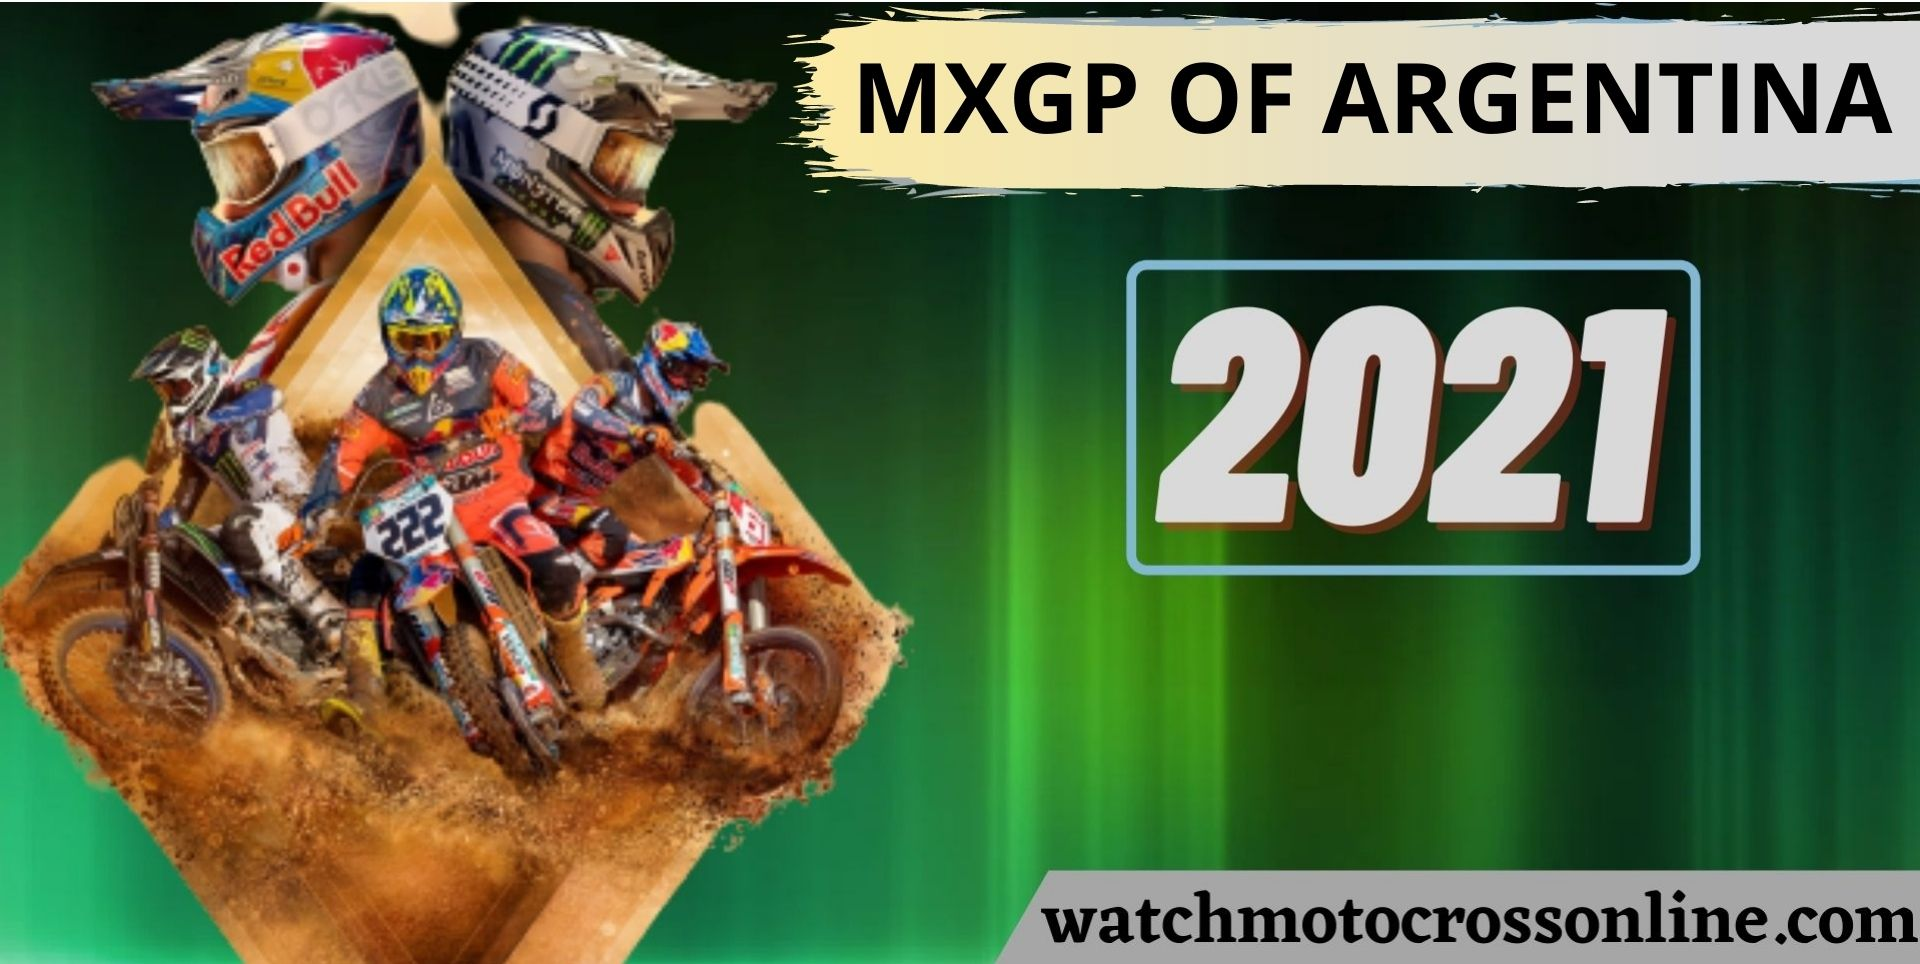 MXGP Of Argentina Live Stream 2021